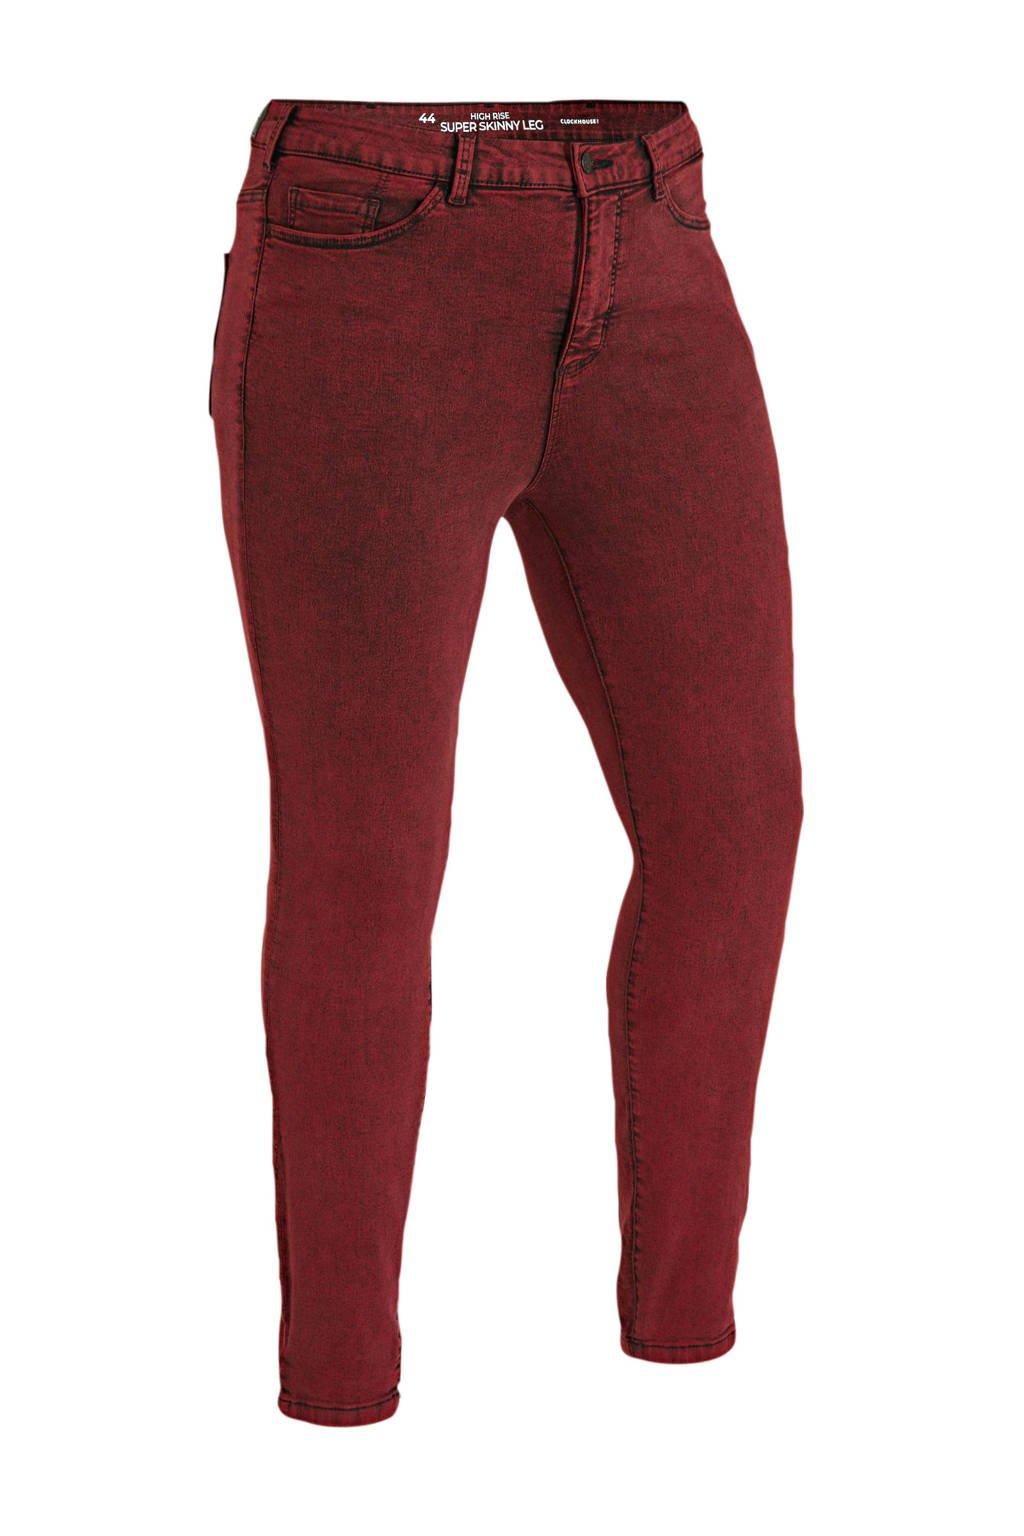 C&A XL Clockhouse high waist super skinny jeans rood, Rood